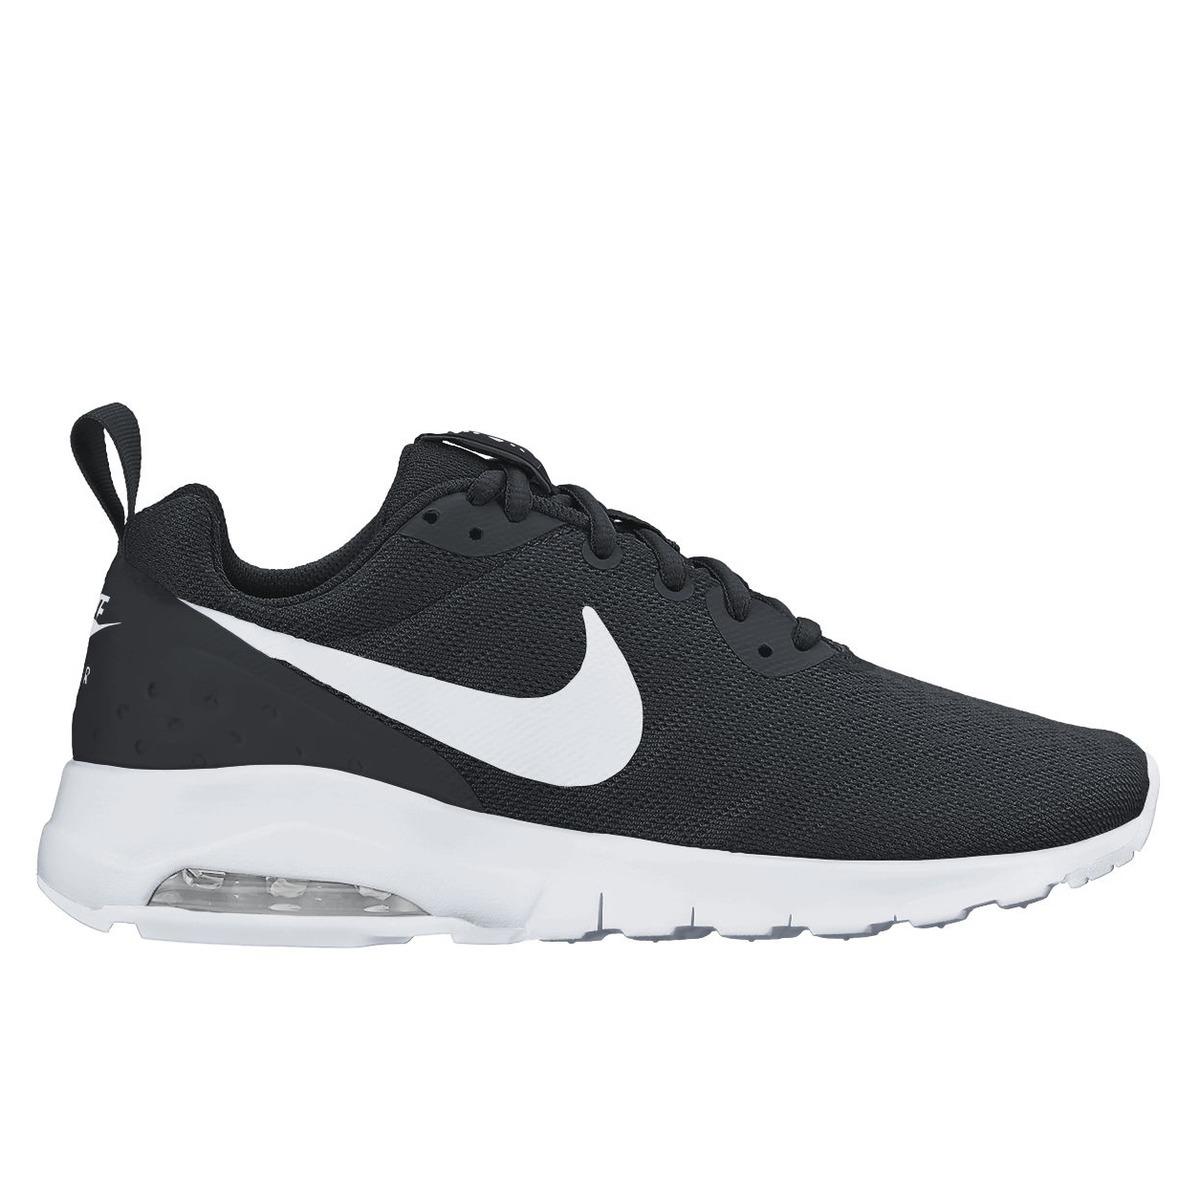 dame Svart dameXXL Nike Lwsneakers Motion Air Max Fritidssko DHI29YWE